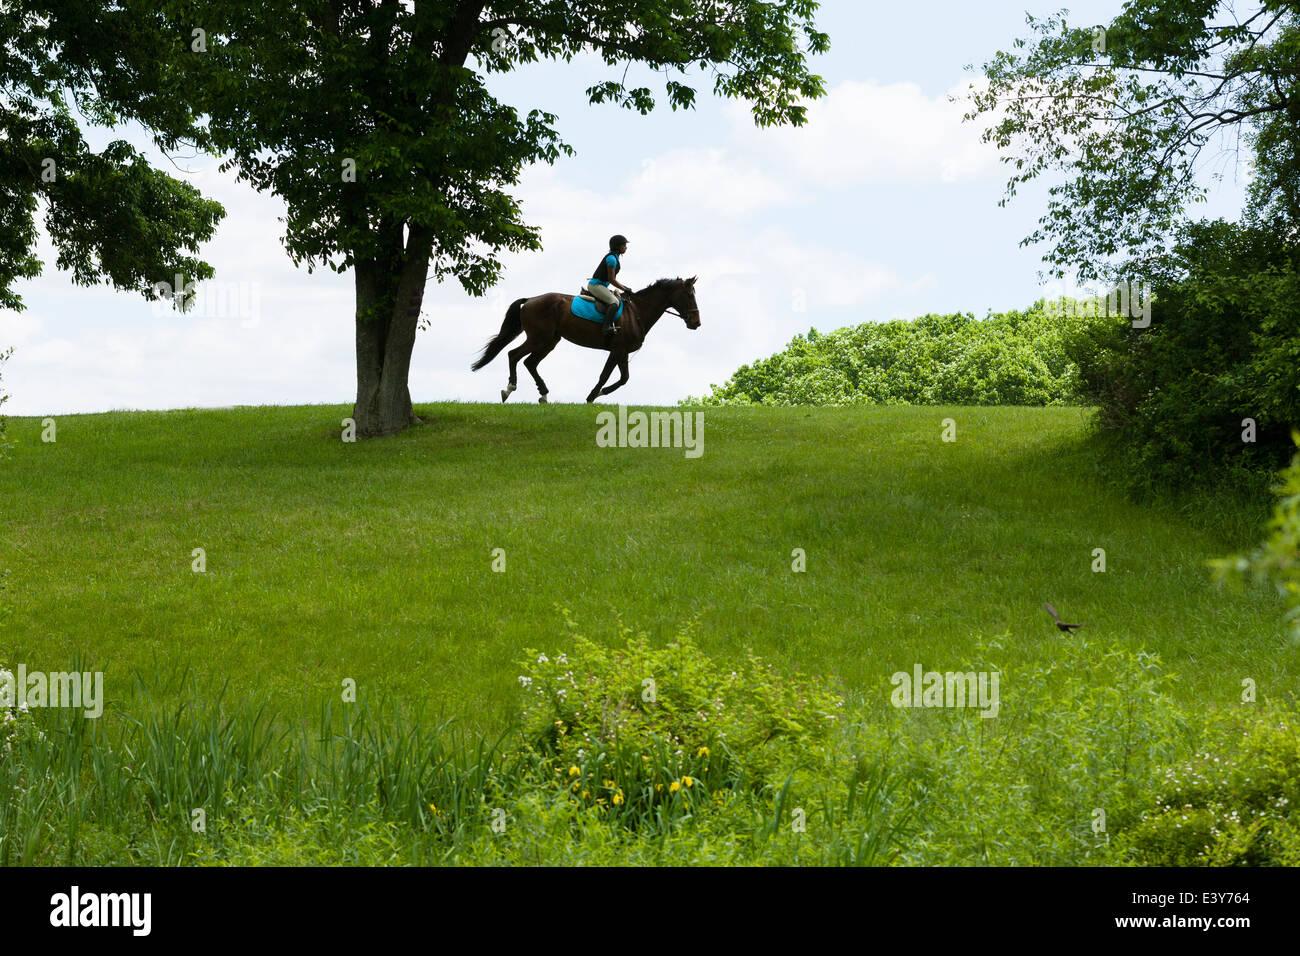 Pferd Reiter Reiten durch Feld Landschaft Stockbild